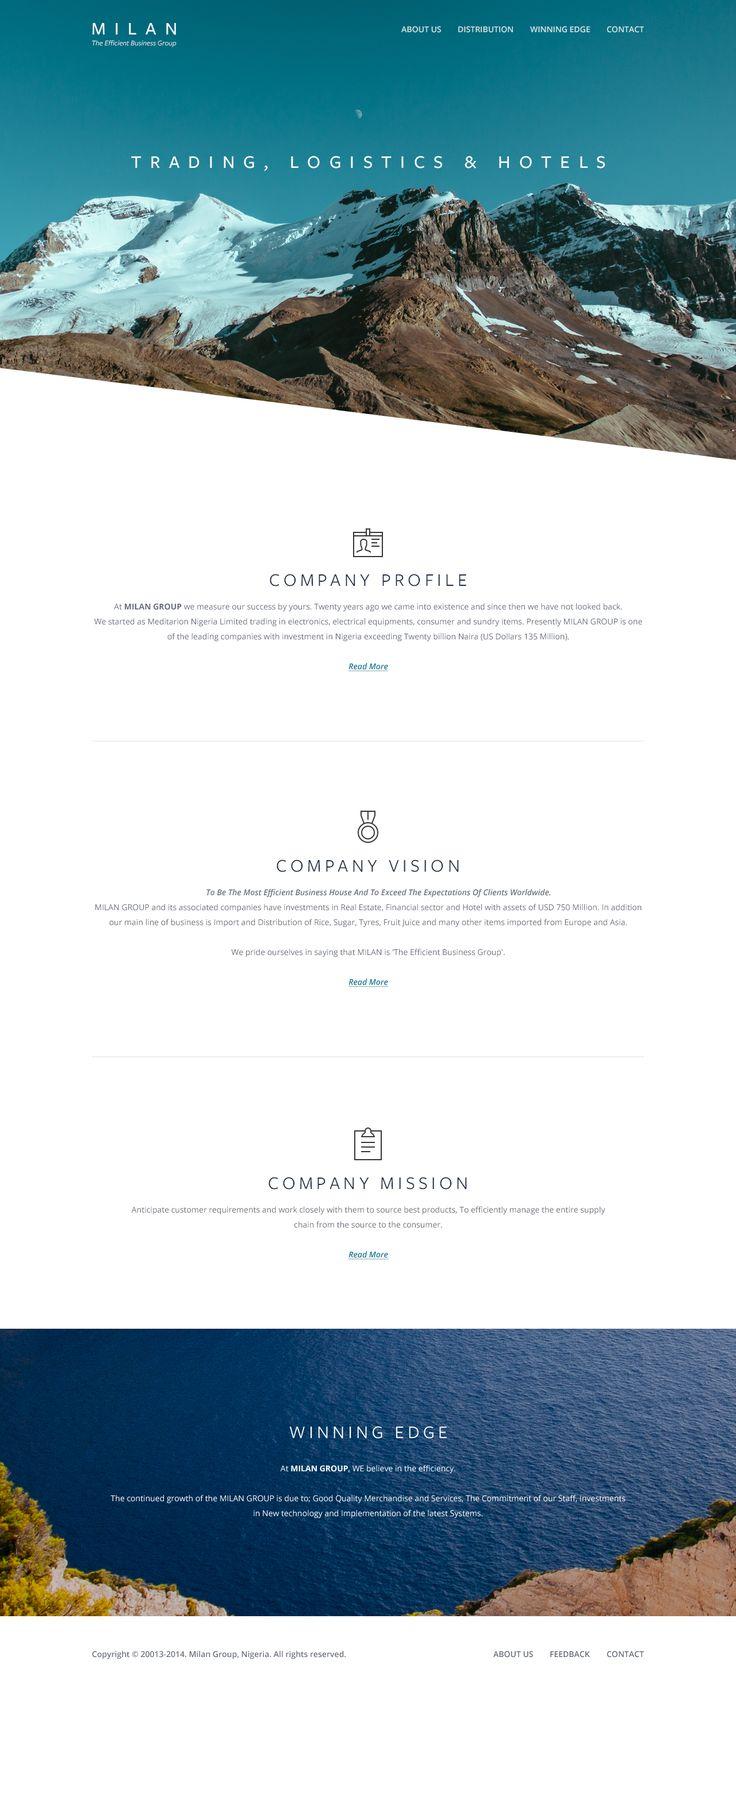 Milan Business Group Website Landing Page Design